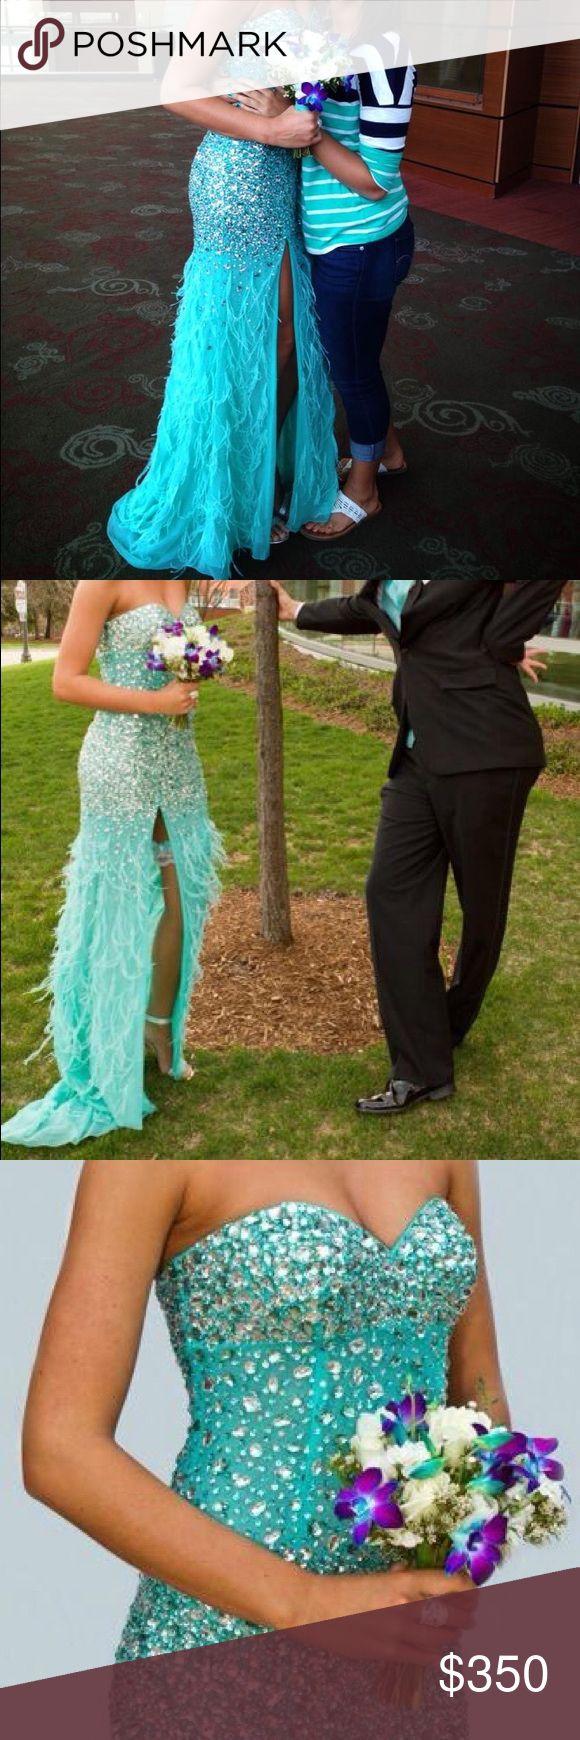 Selling this SIZE 2 Turquoise prom dress 👗 on Poshmark! My username is: baileyo5. #shopmycloset #poshmark #fashion #shopping #style #forsale #PeachesBotique #Dresses & Skirts